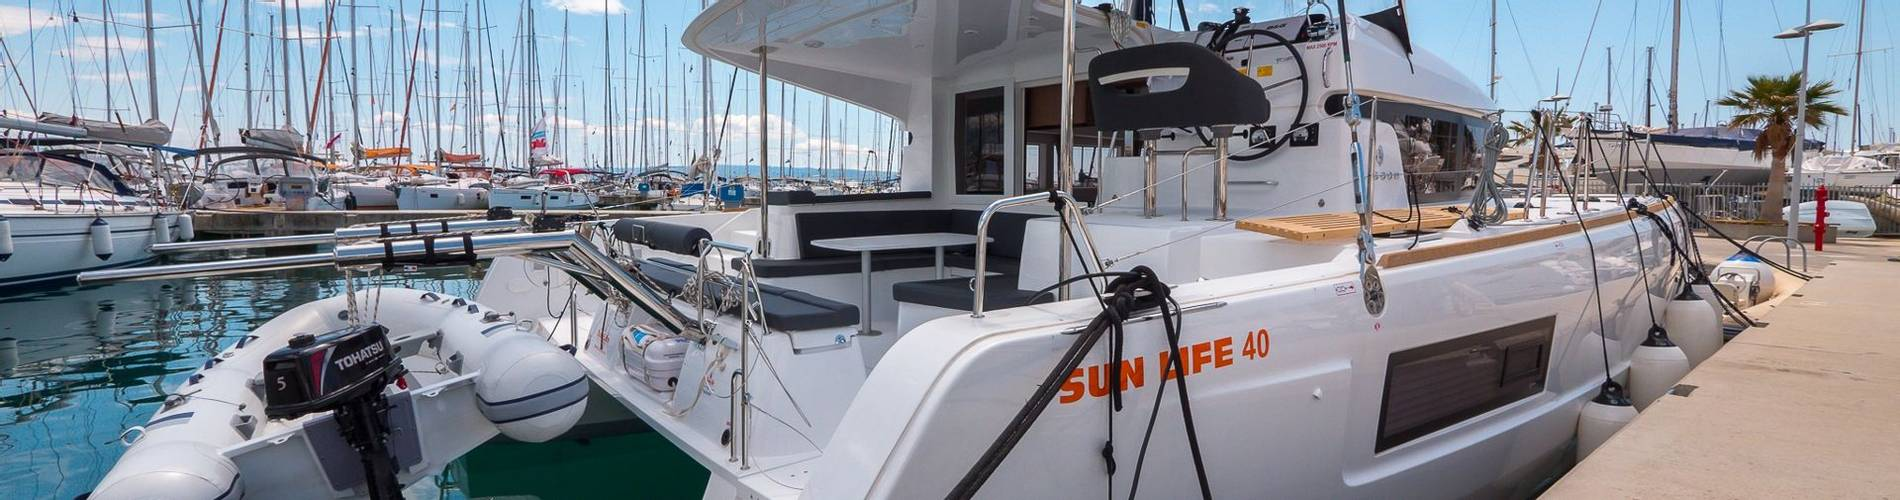 catamaran cruise 15.jpg